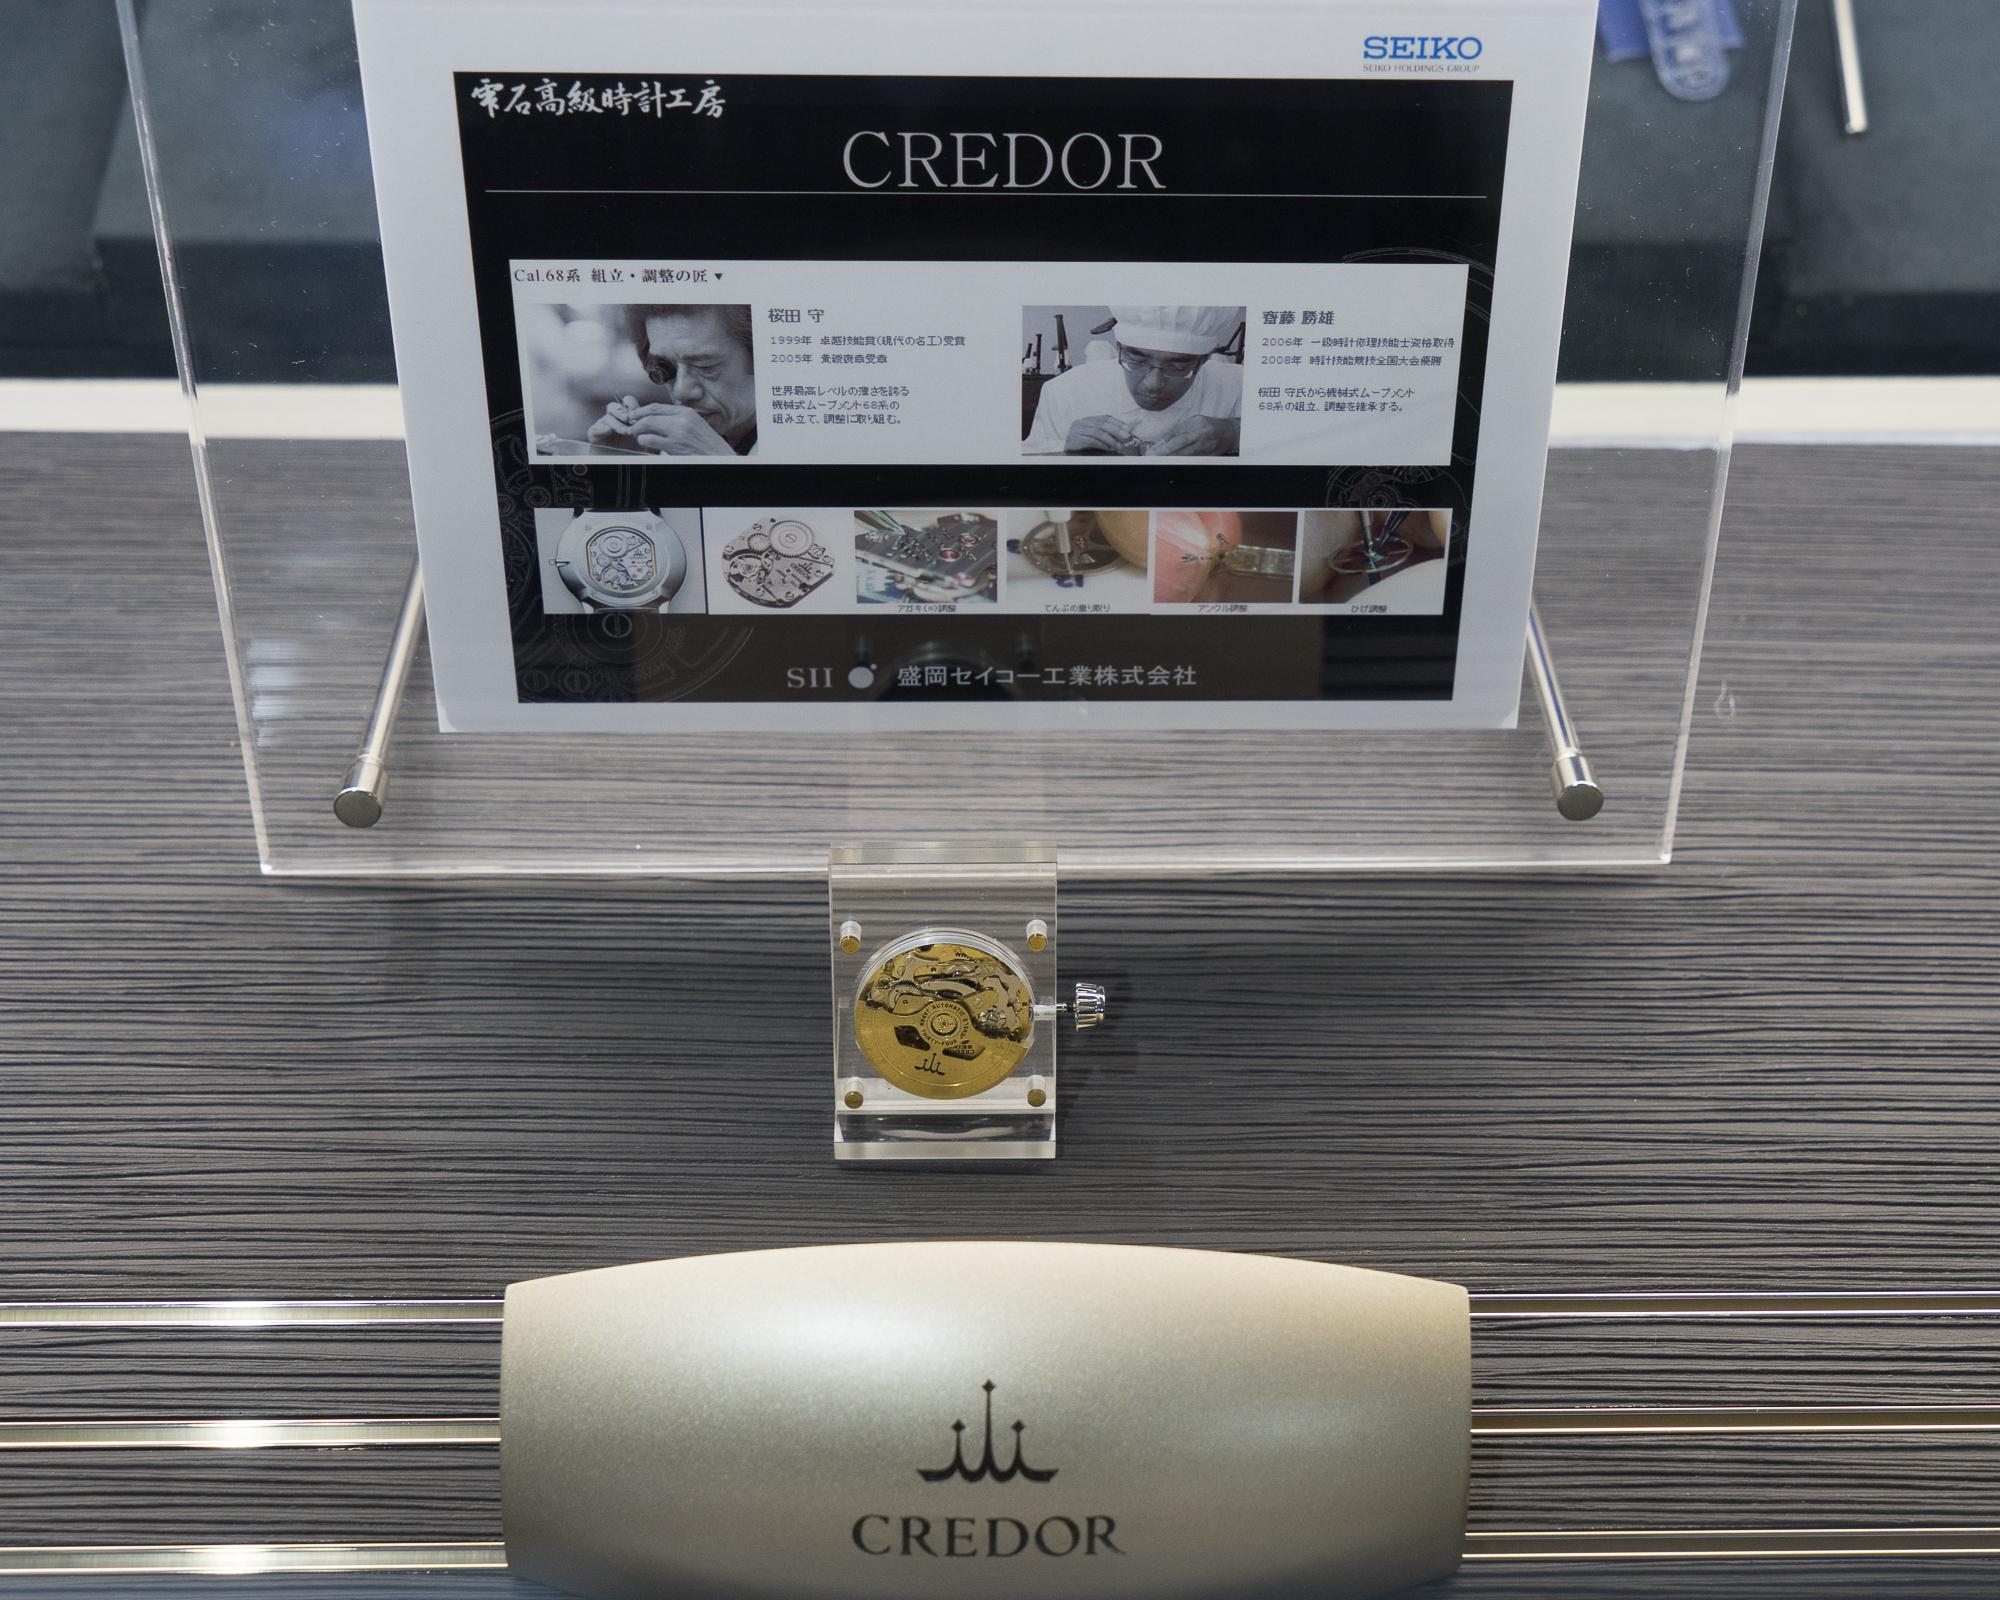 68 Series Credor